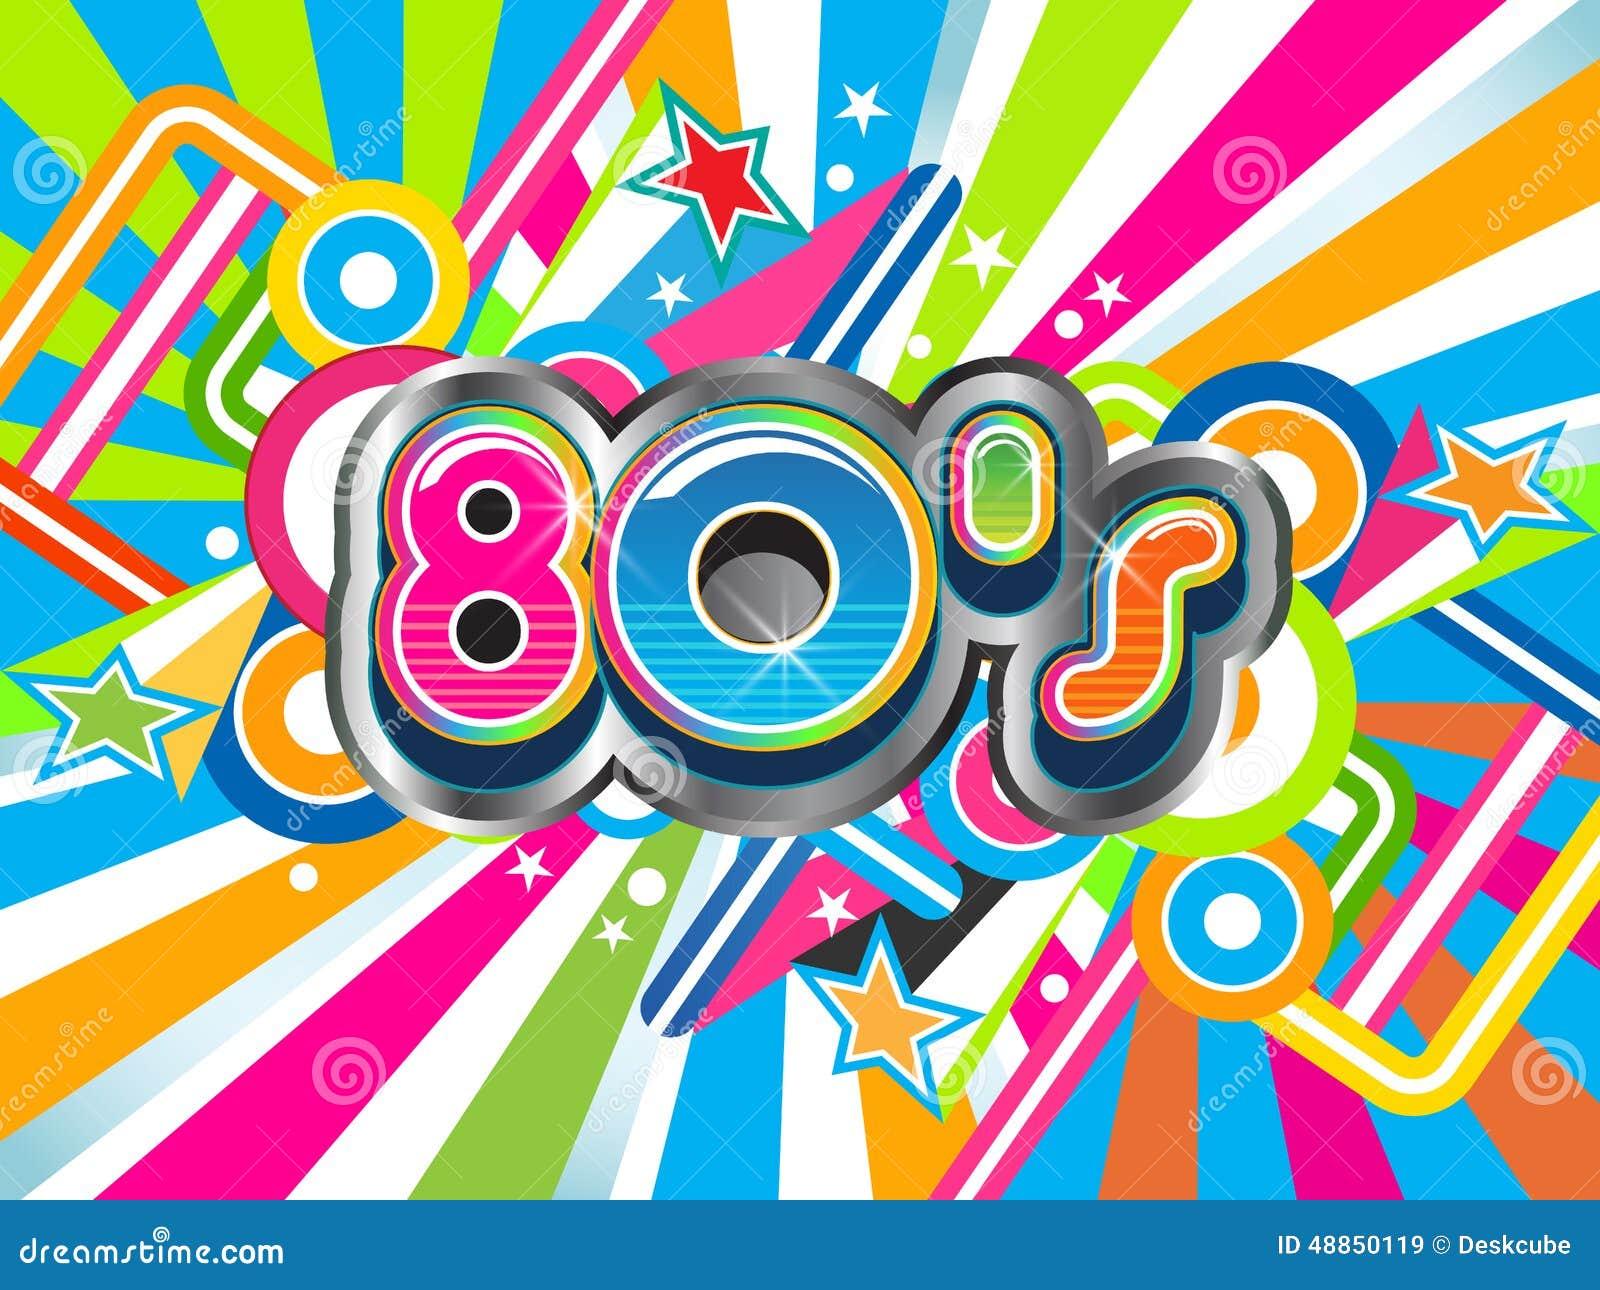 80s Stock Illustrations – 20,681 80s Stock Illustrations ...